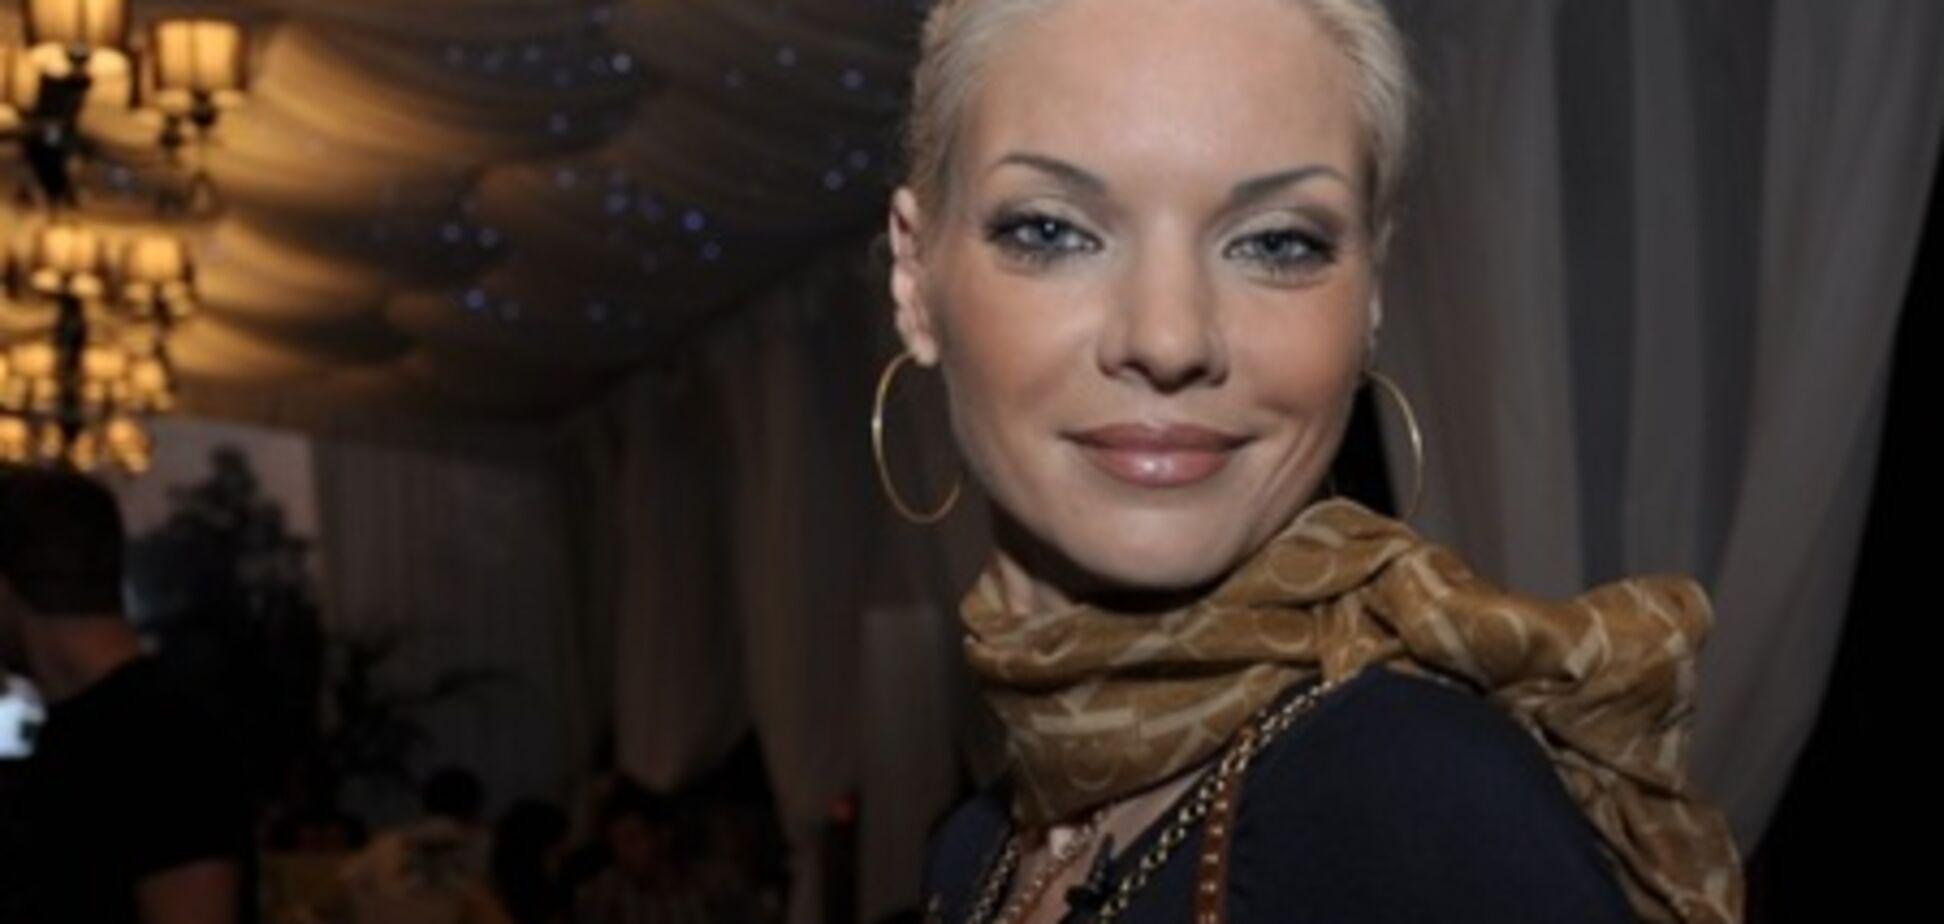 У Власенко дома висит люстра за $50 000 - бывшая жена